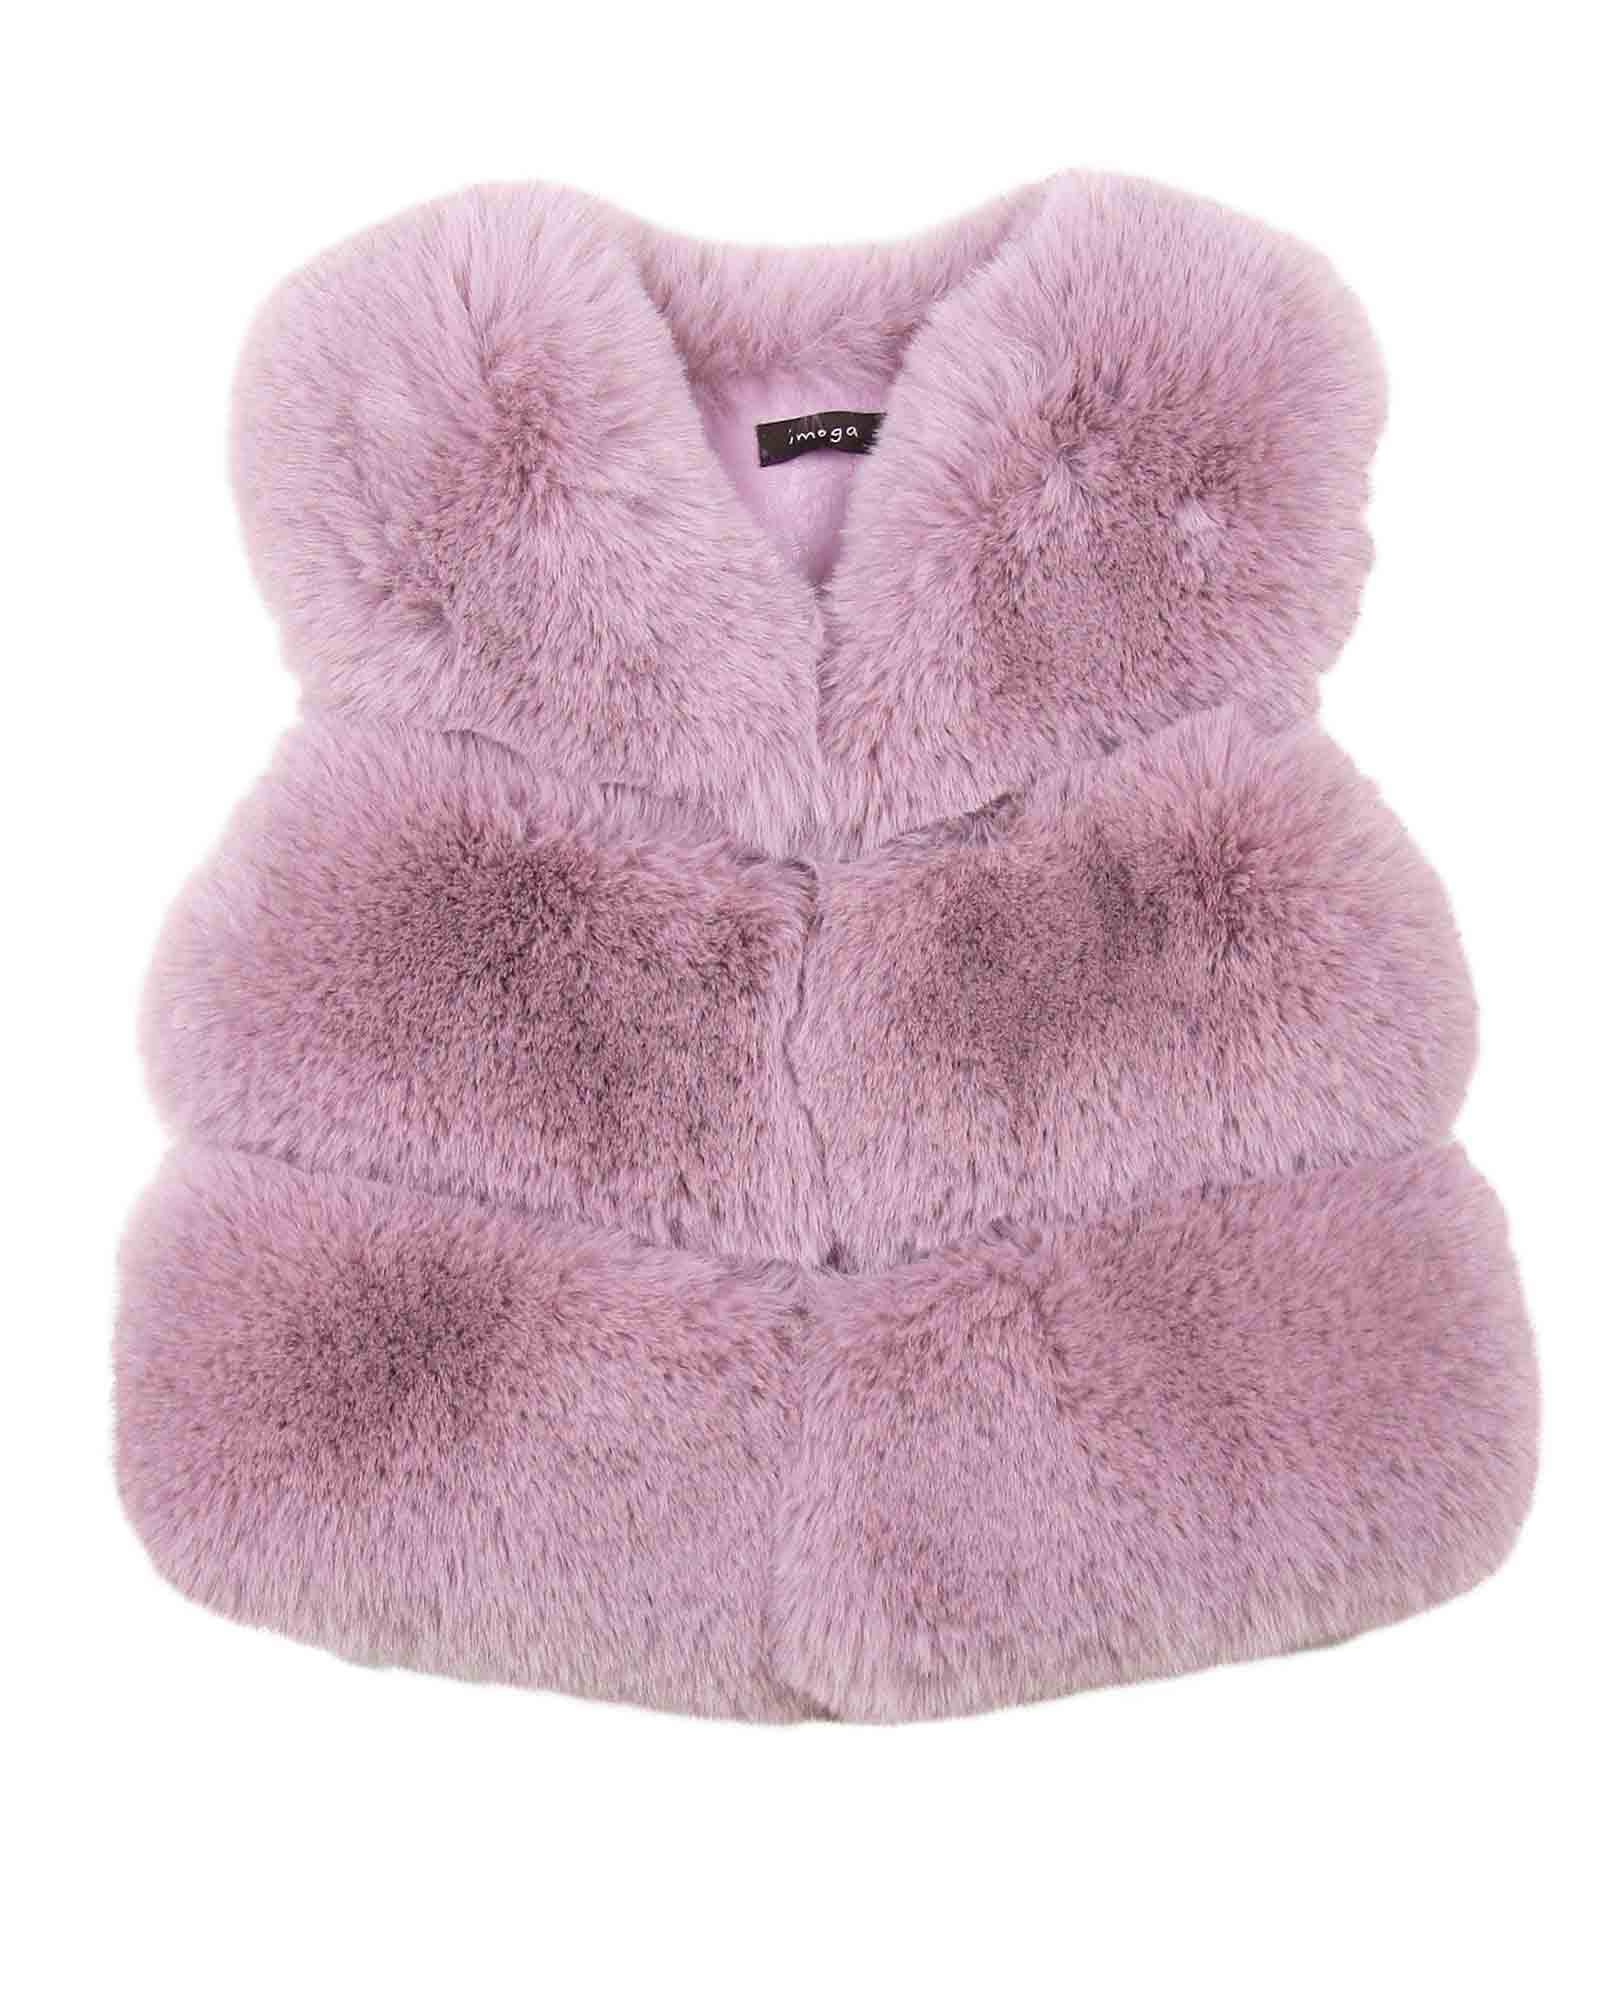 Imoga Girl's Faux Fur Puffer Vest Gia, Sizes 6-14 - 8 Pink by Imoga